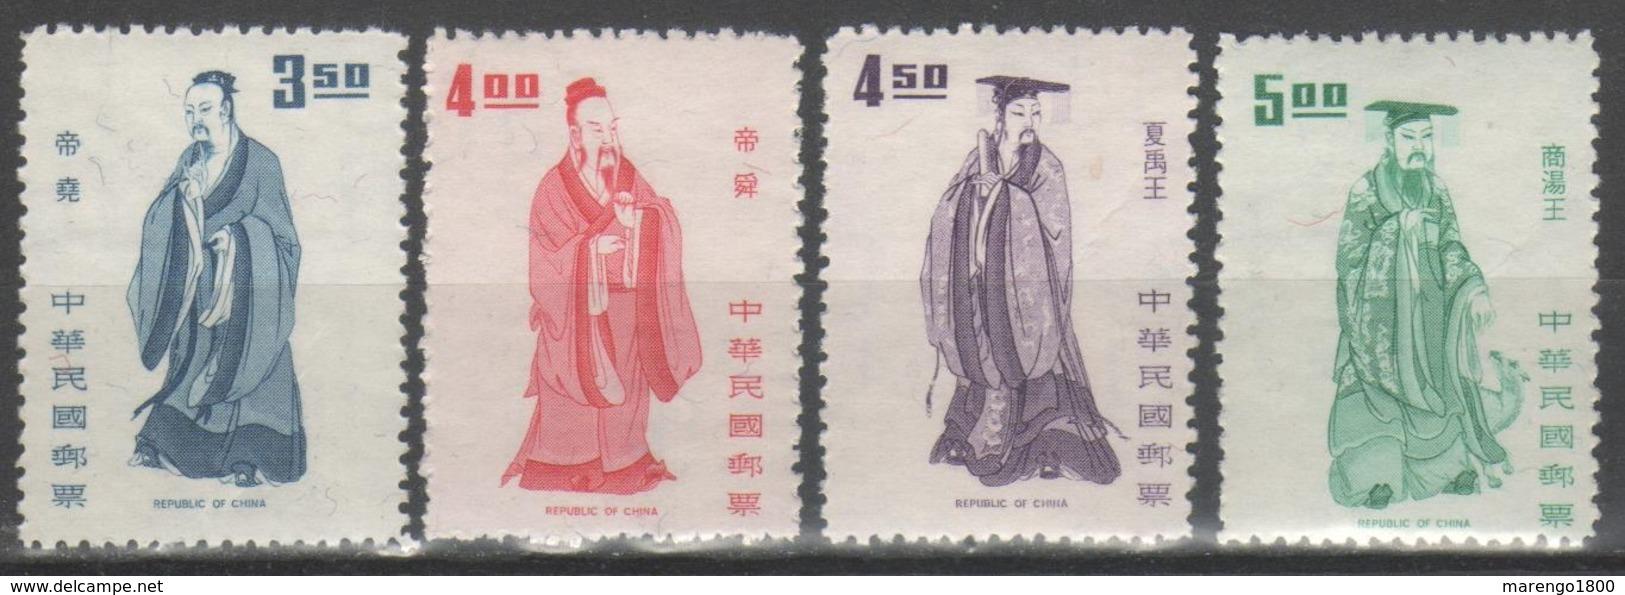 Taiwan 1972 - Personalità          (g5406) - Unused Stamps